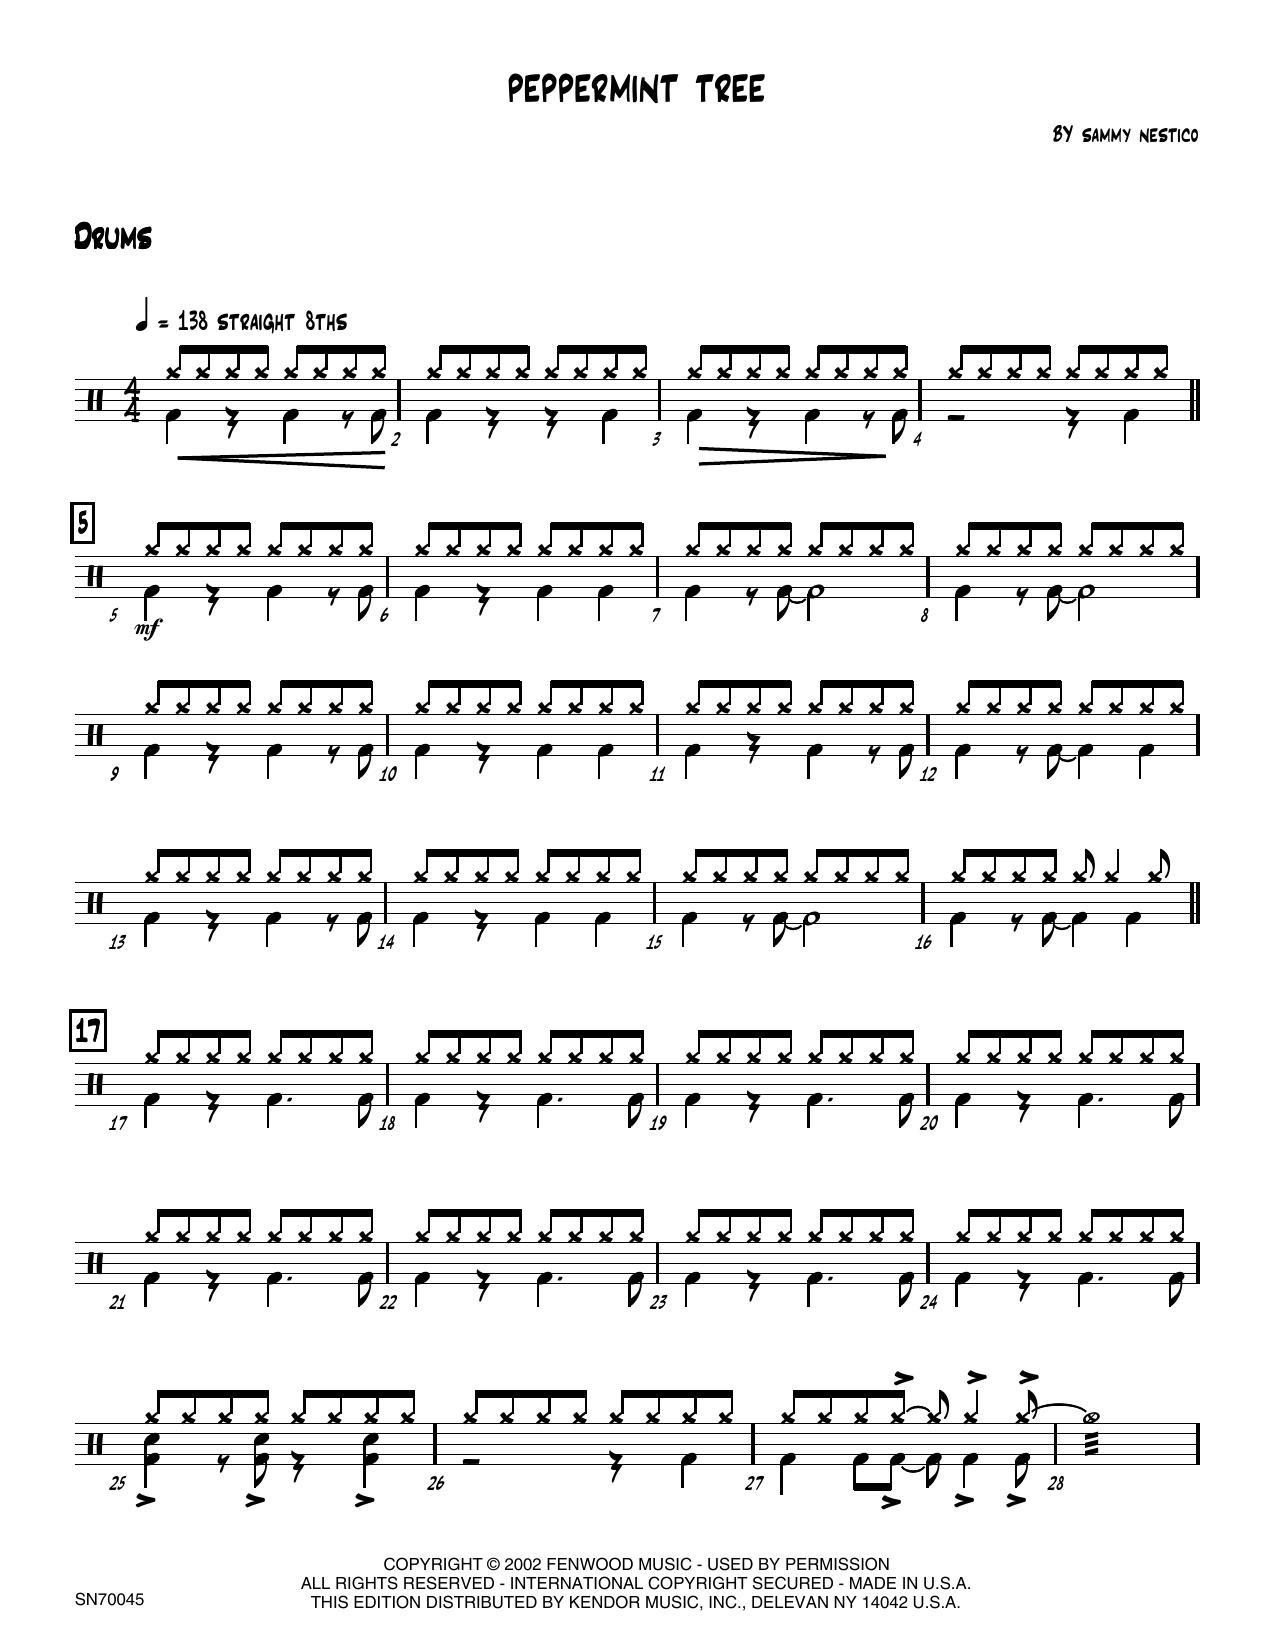 Peppermint Tree - Drum Set Sheet Music